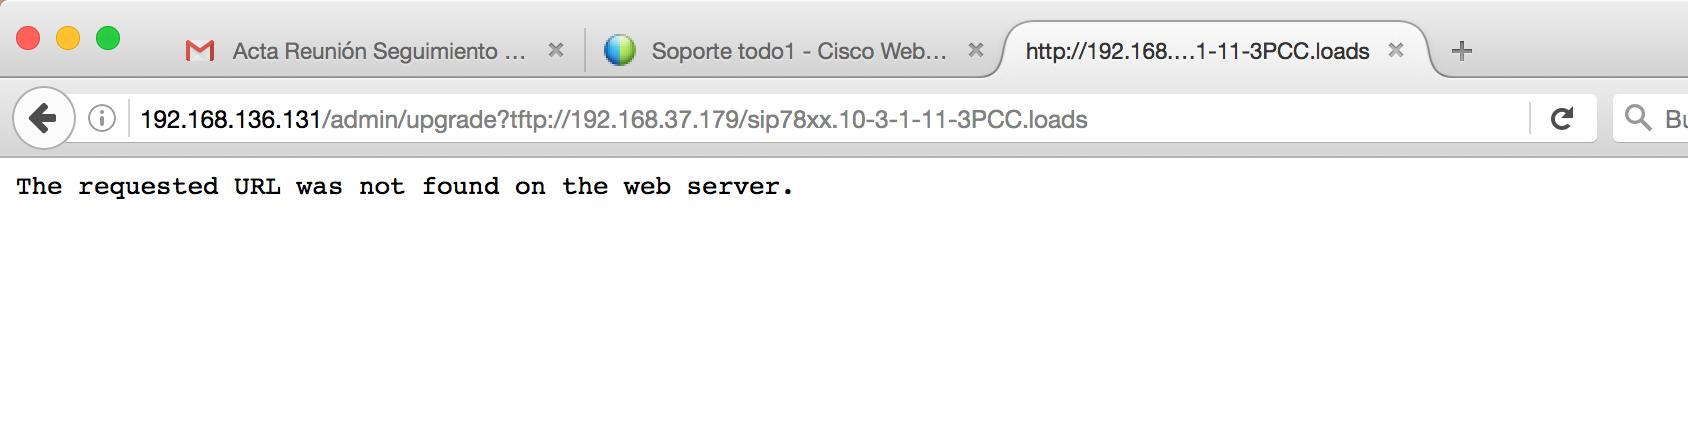 Upgrade cisco phone for 3rd Party Call     - Cisco Community